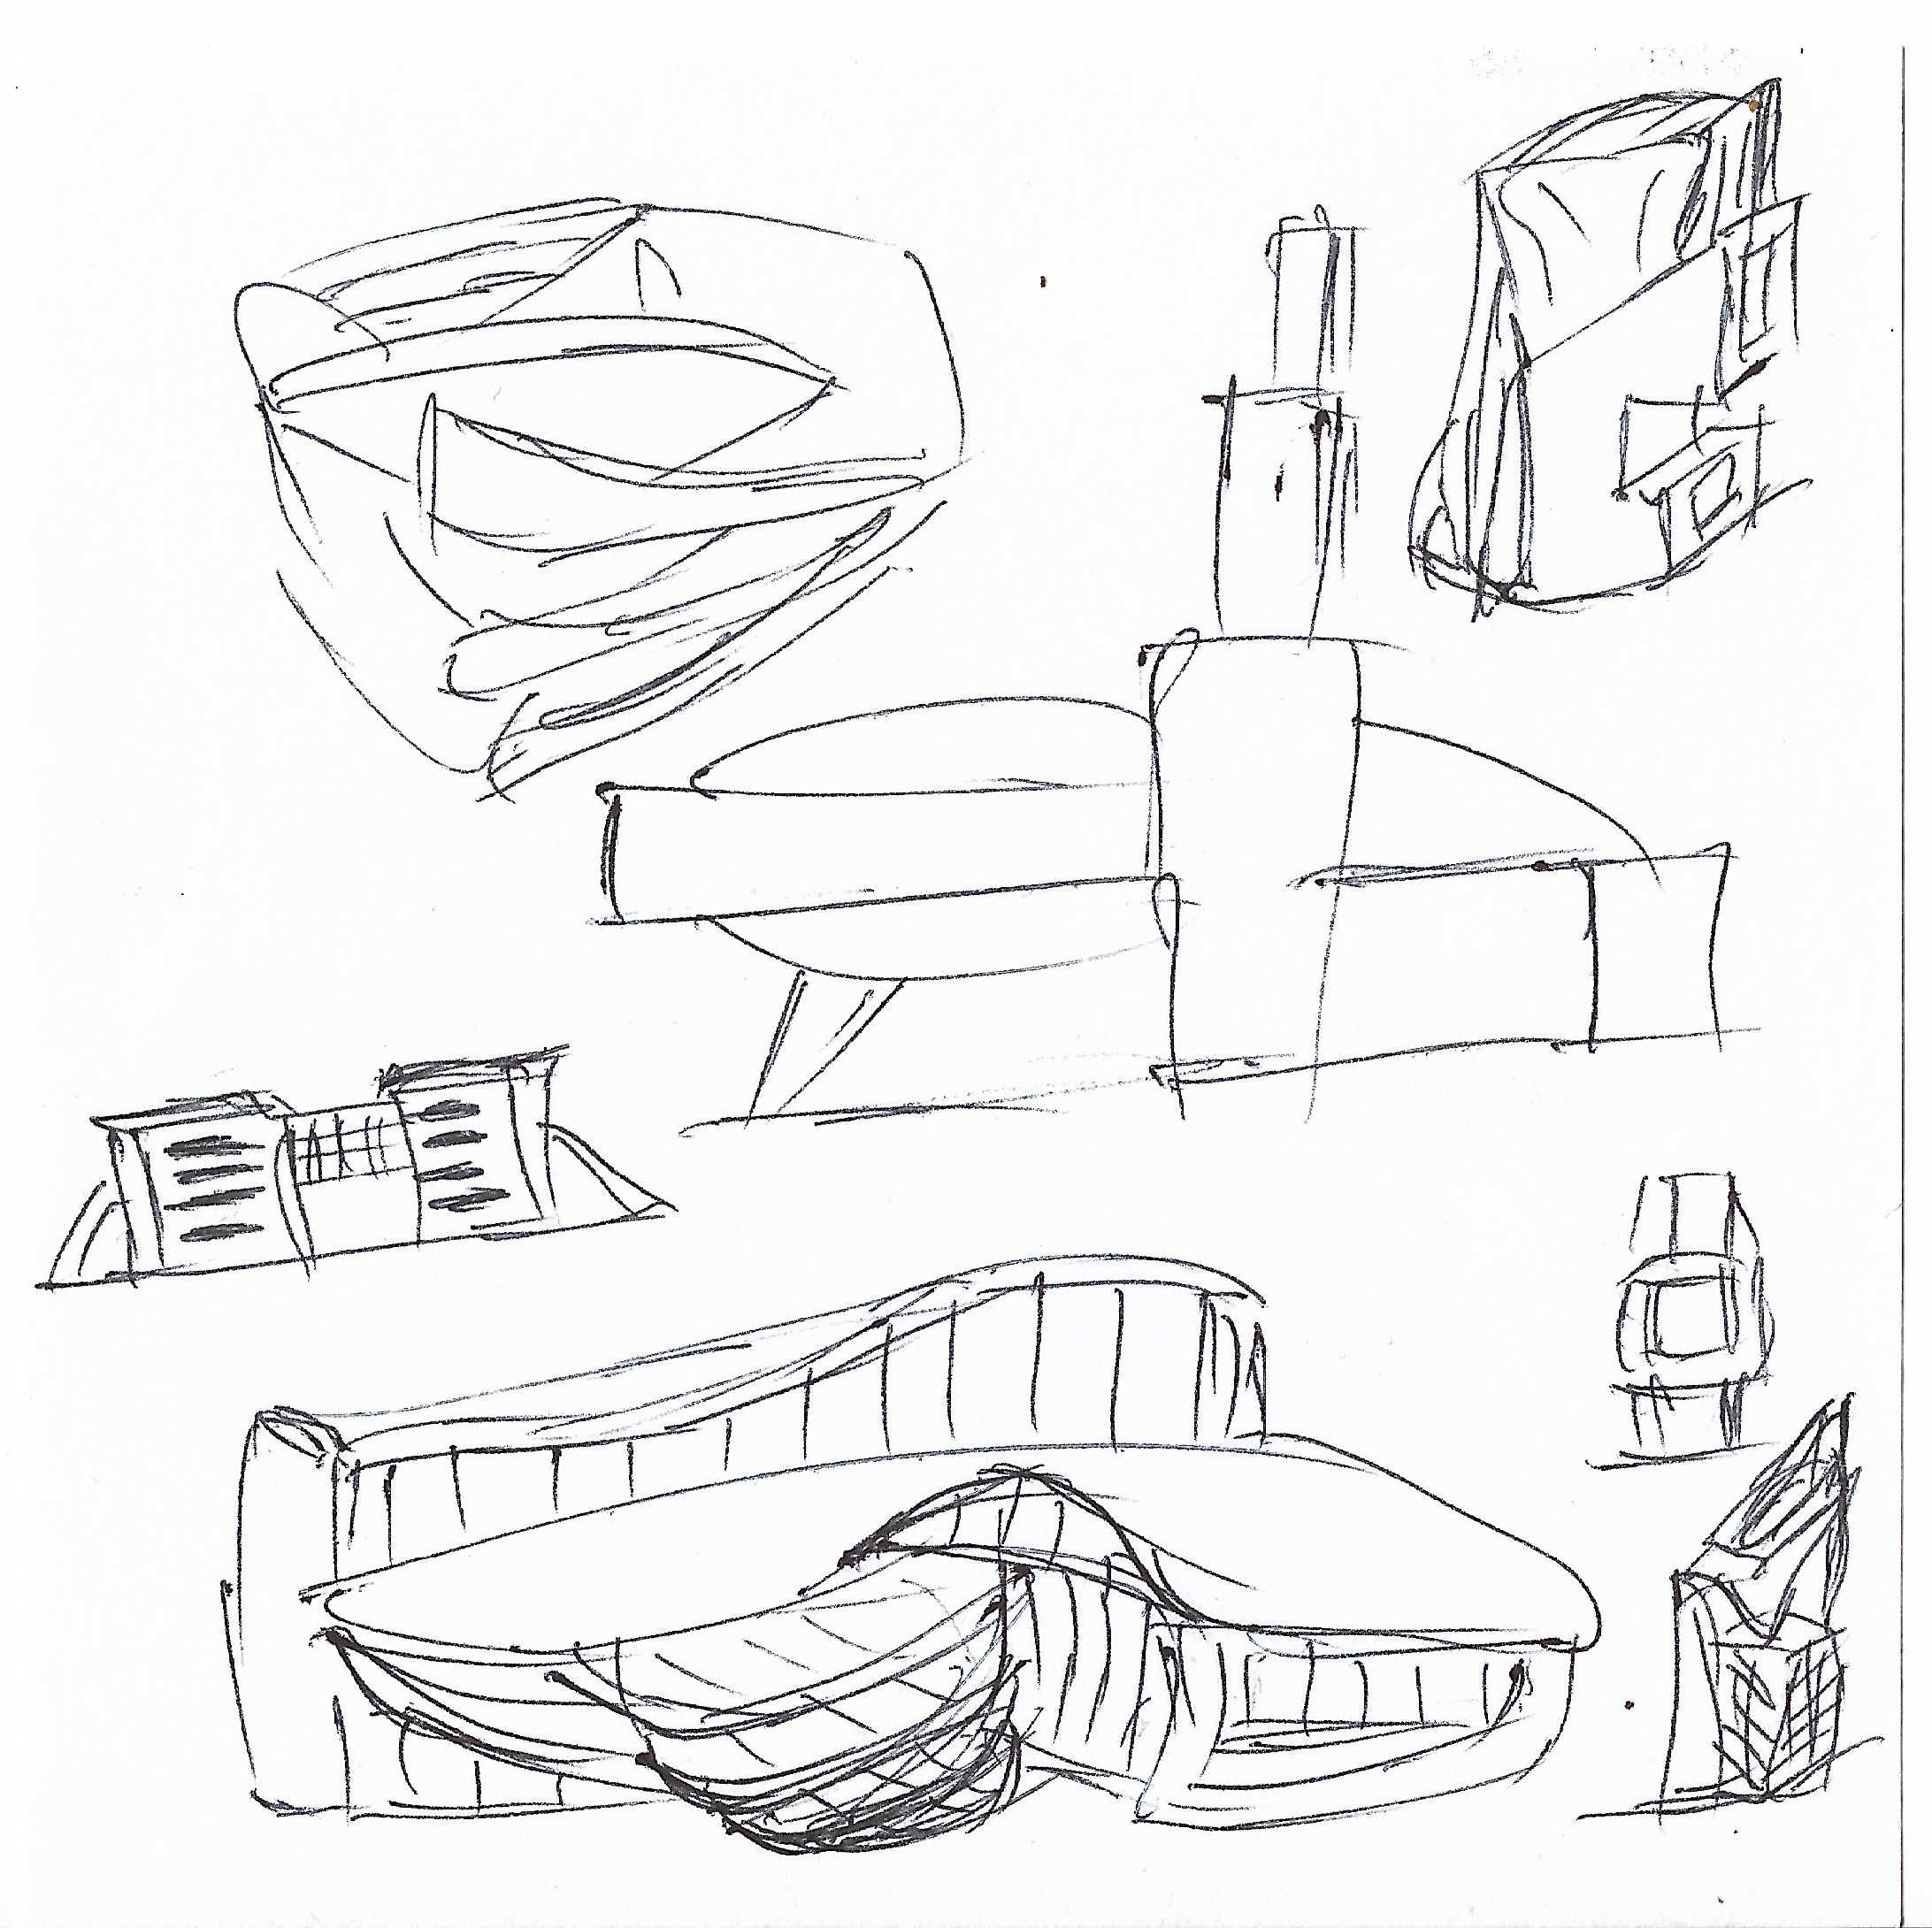 Pin By Bozelos Panagiotis On Sketch